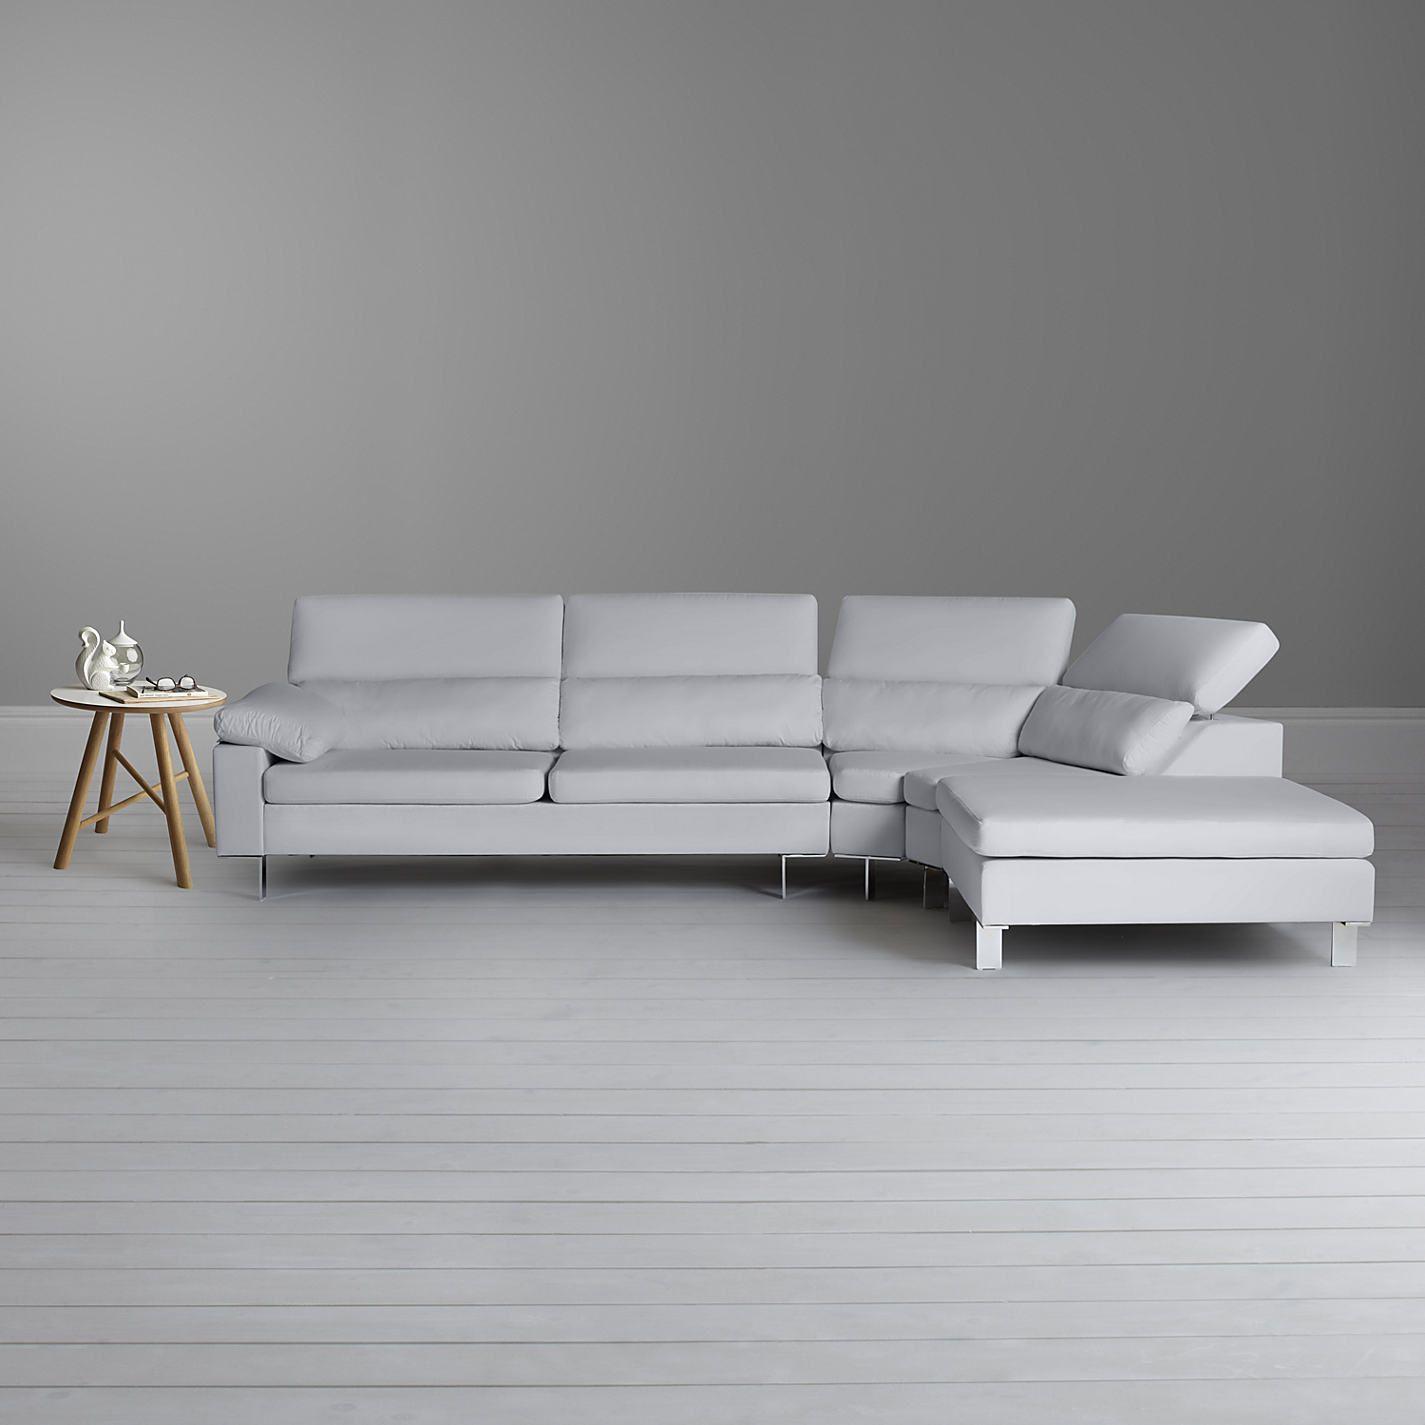 John Lewis Baccara Rhf Small Semi Aniline Leather Corner Sofa Nature Putty Leather Corner Sofa Corner Sofa Sofa